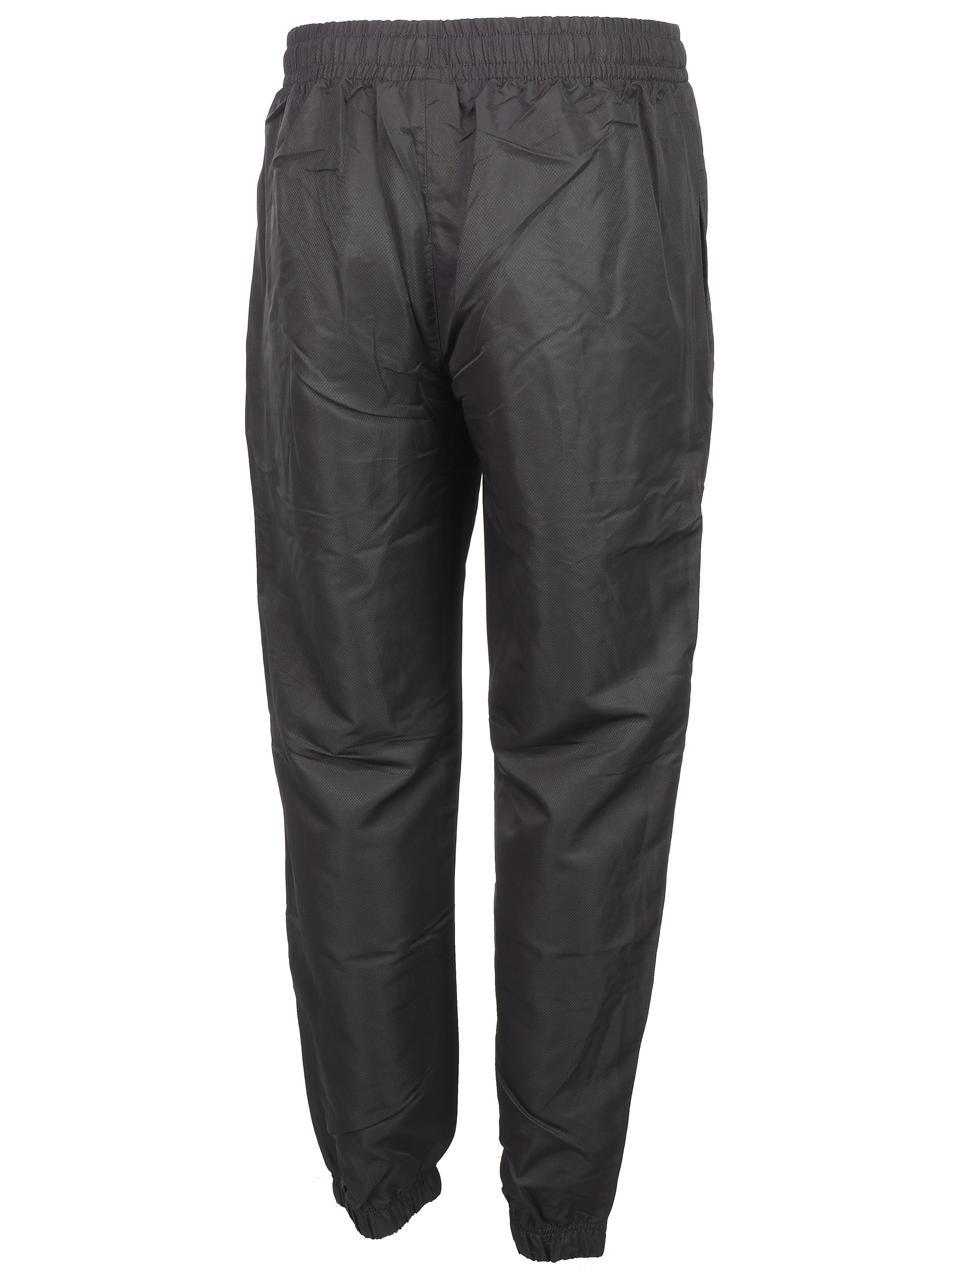 Pantalon-de-survetement-Sergio-tacchini-Carson-016-anth-slim-pant-Gris-10762-N